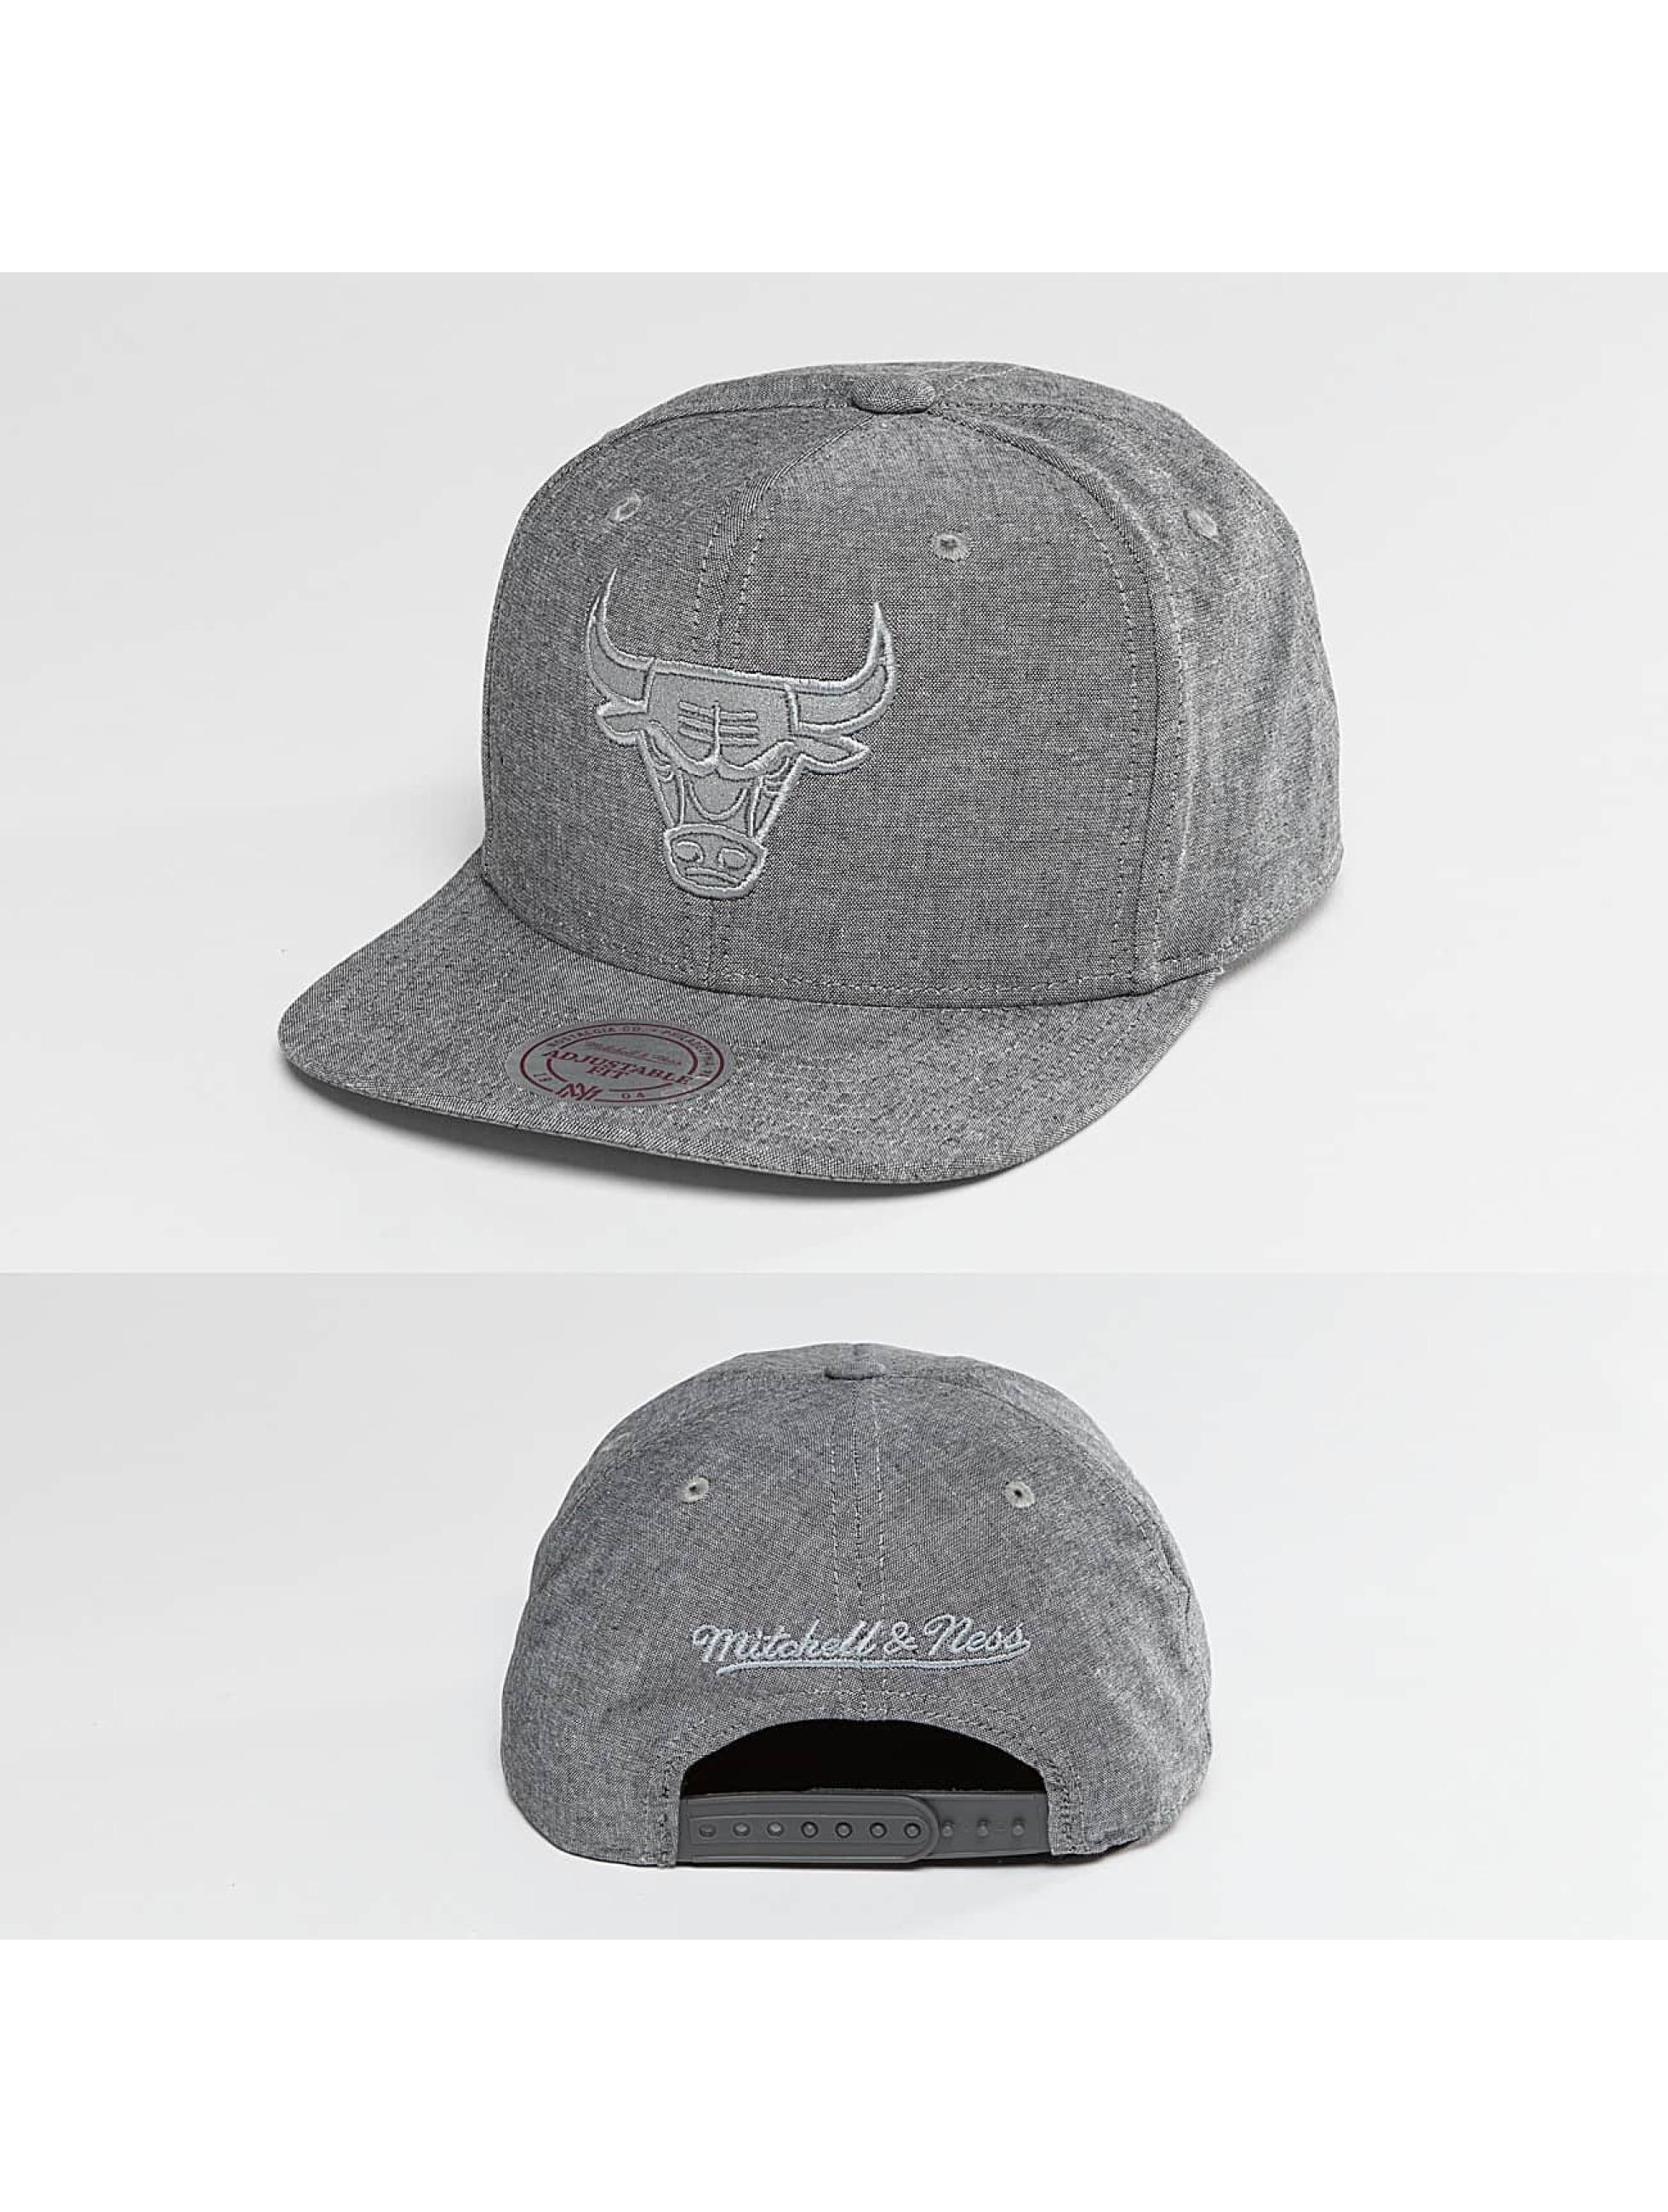 Mitchell & Ness Männer,Frauen Snapback Cap NBA Italian Washed Chicago Bulls in grau